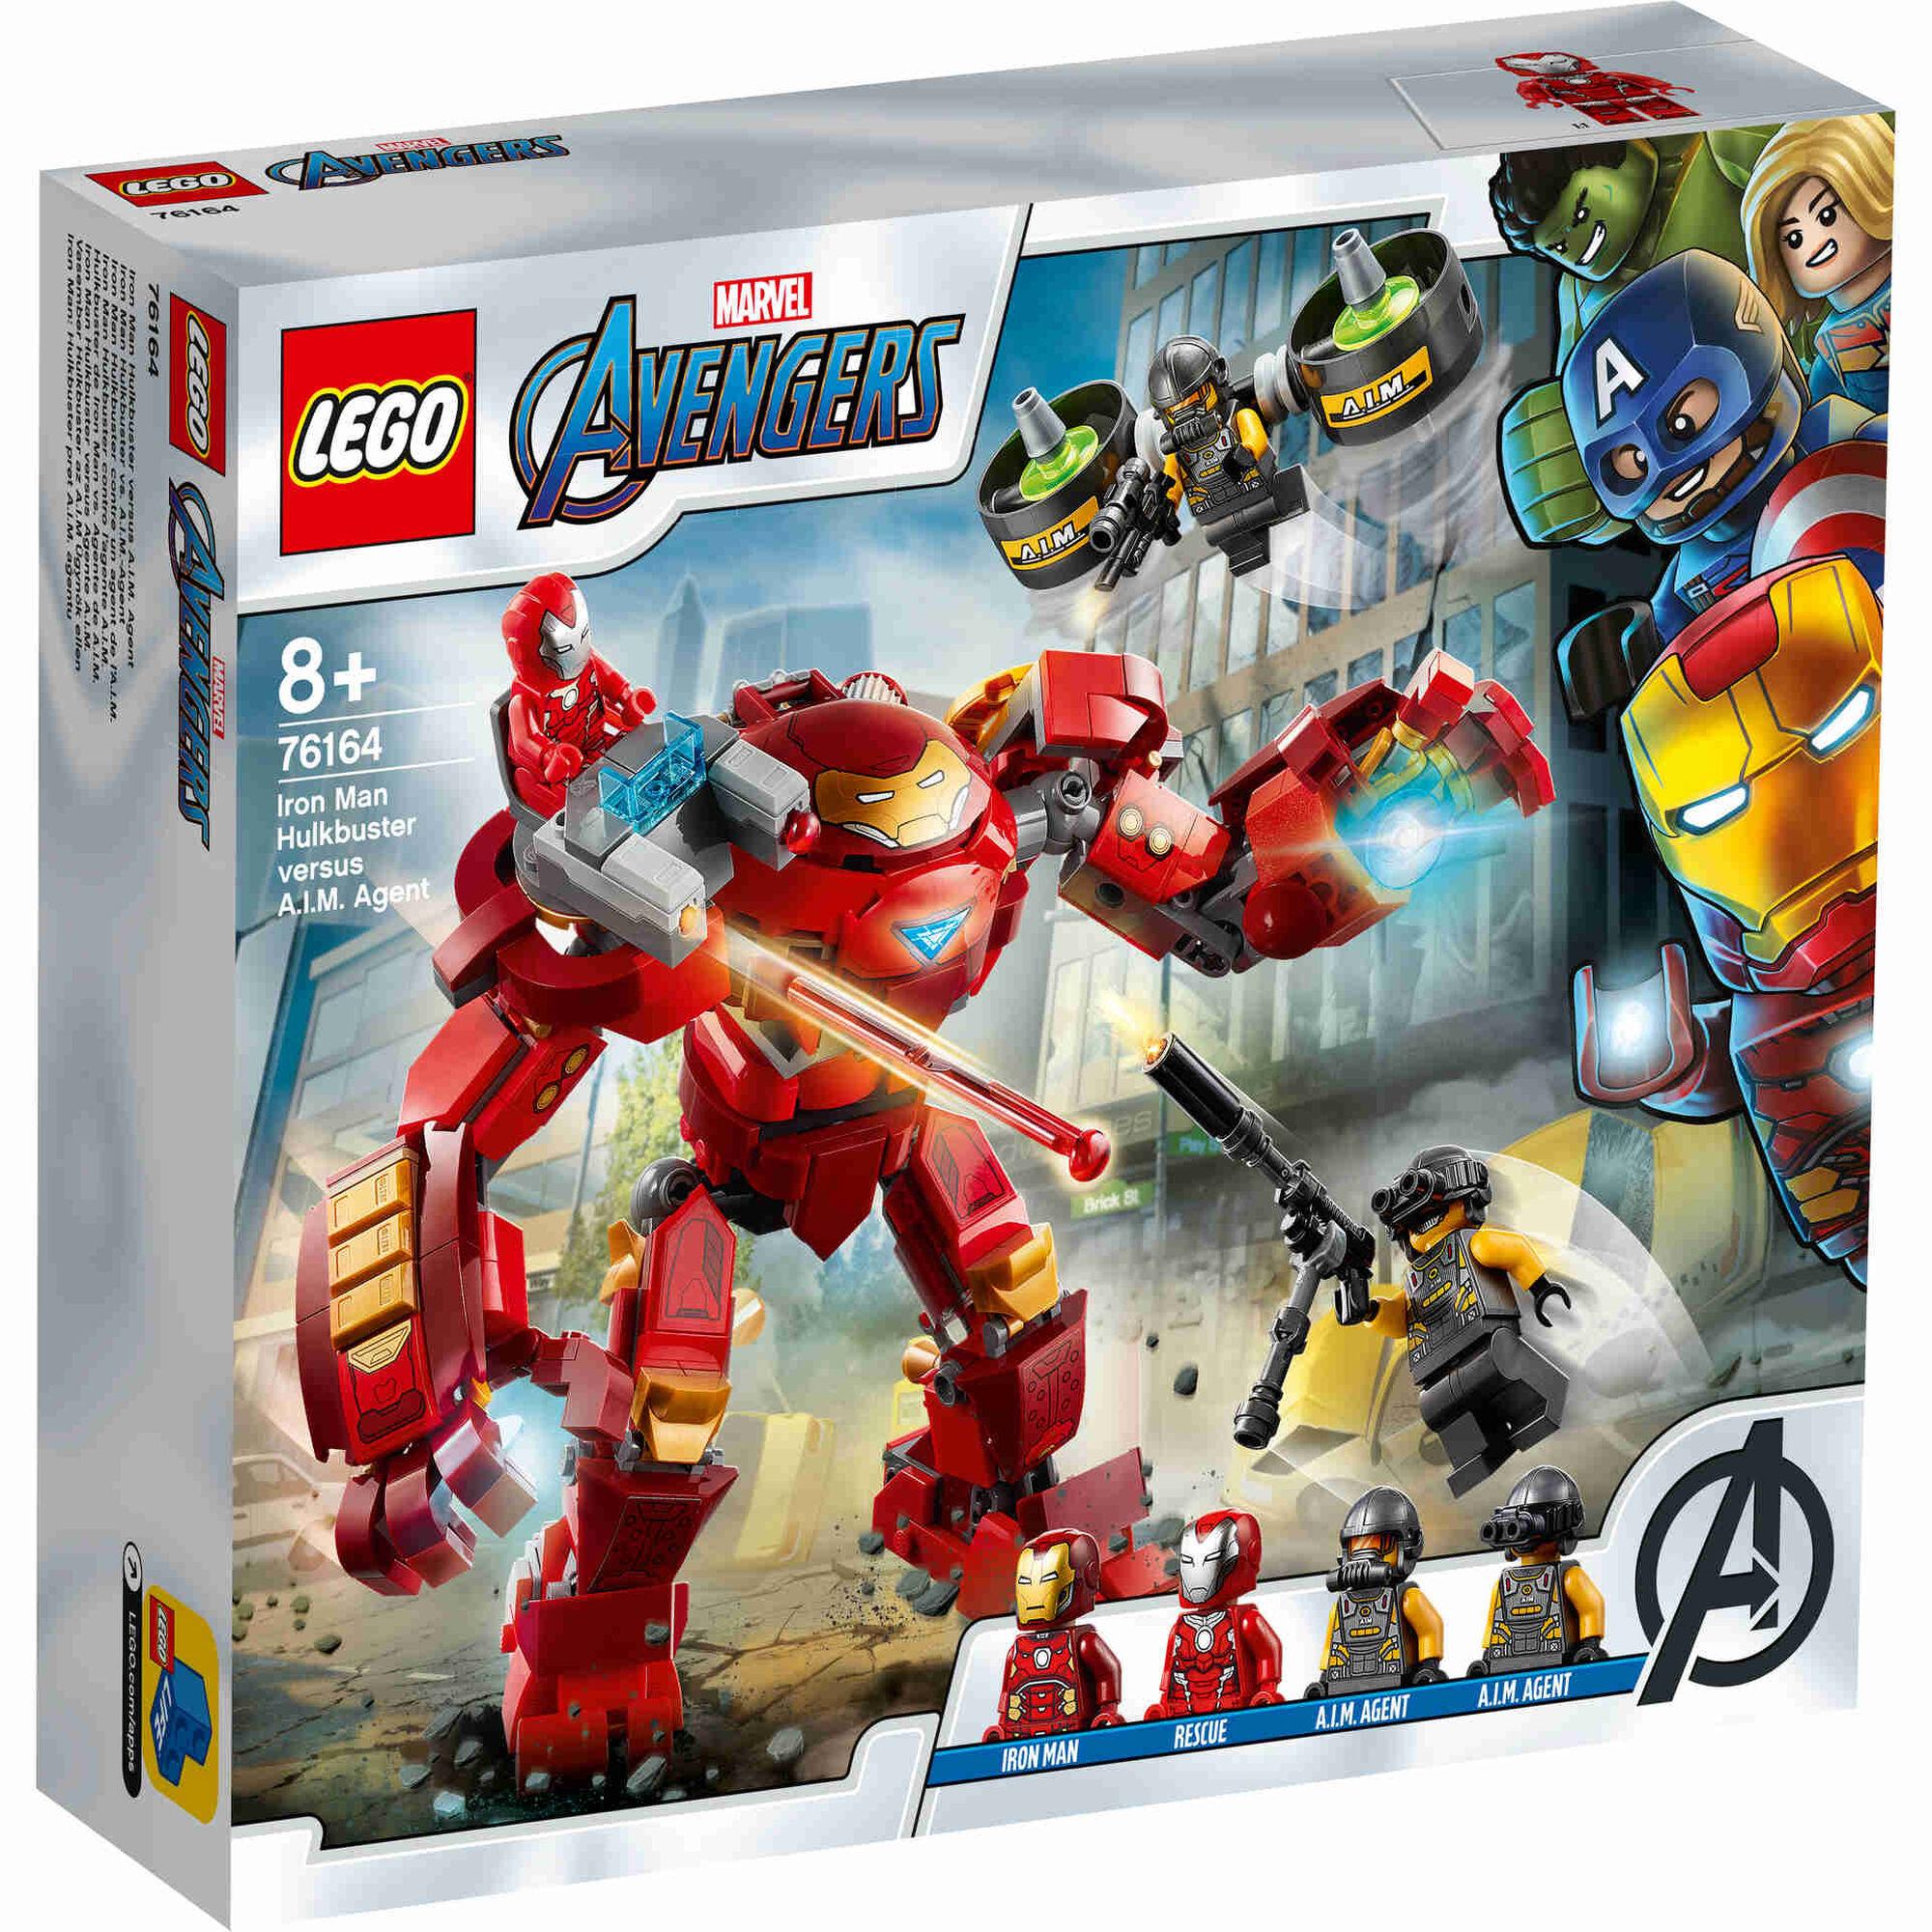 Iron Man Hulkbuster Versus Agente A.I.M. - 76164